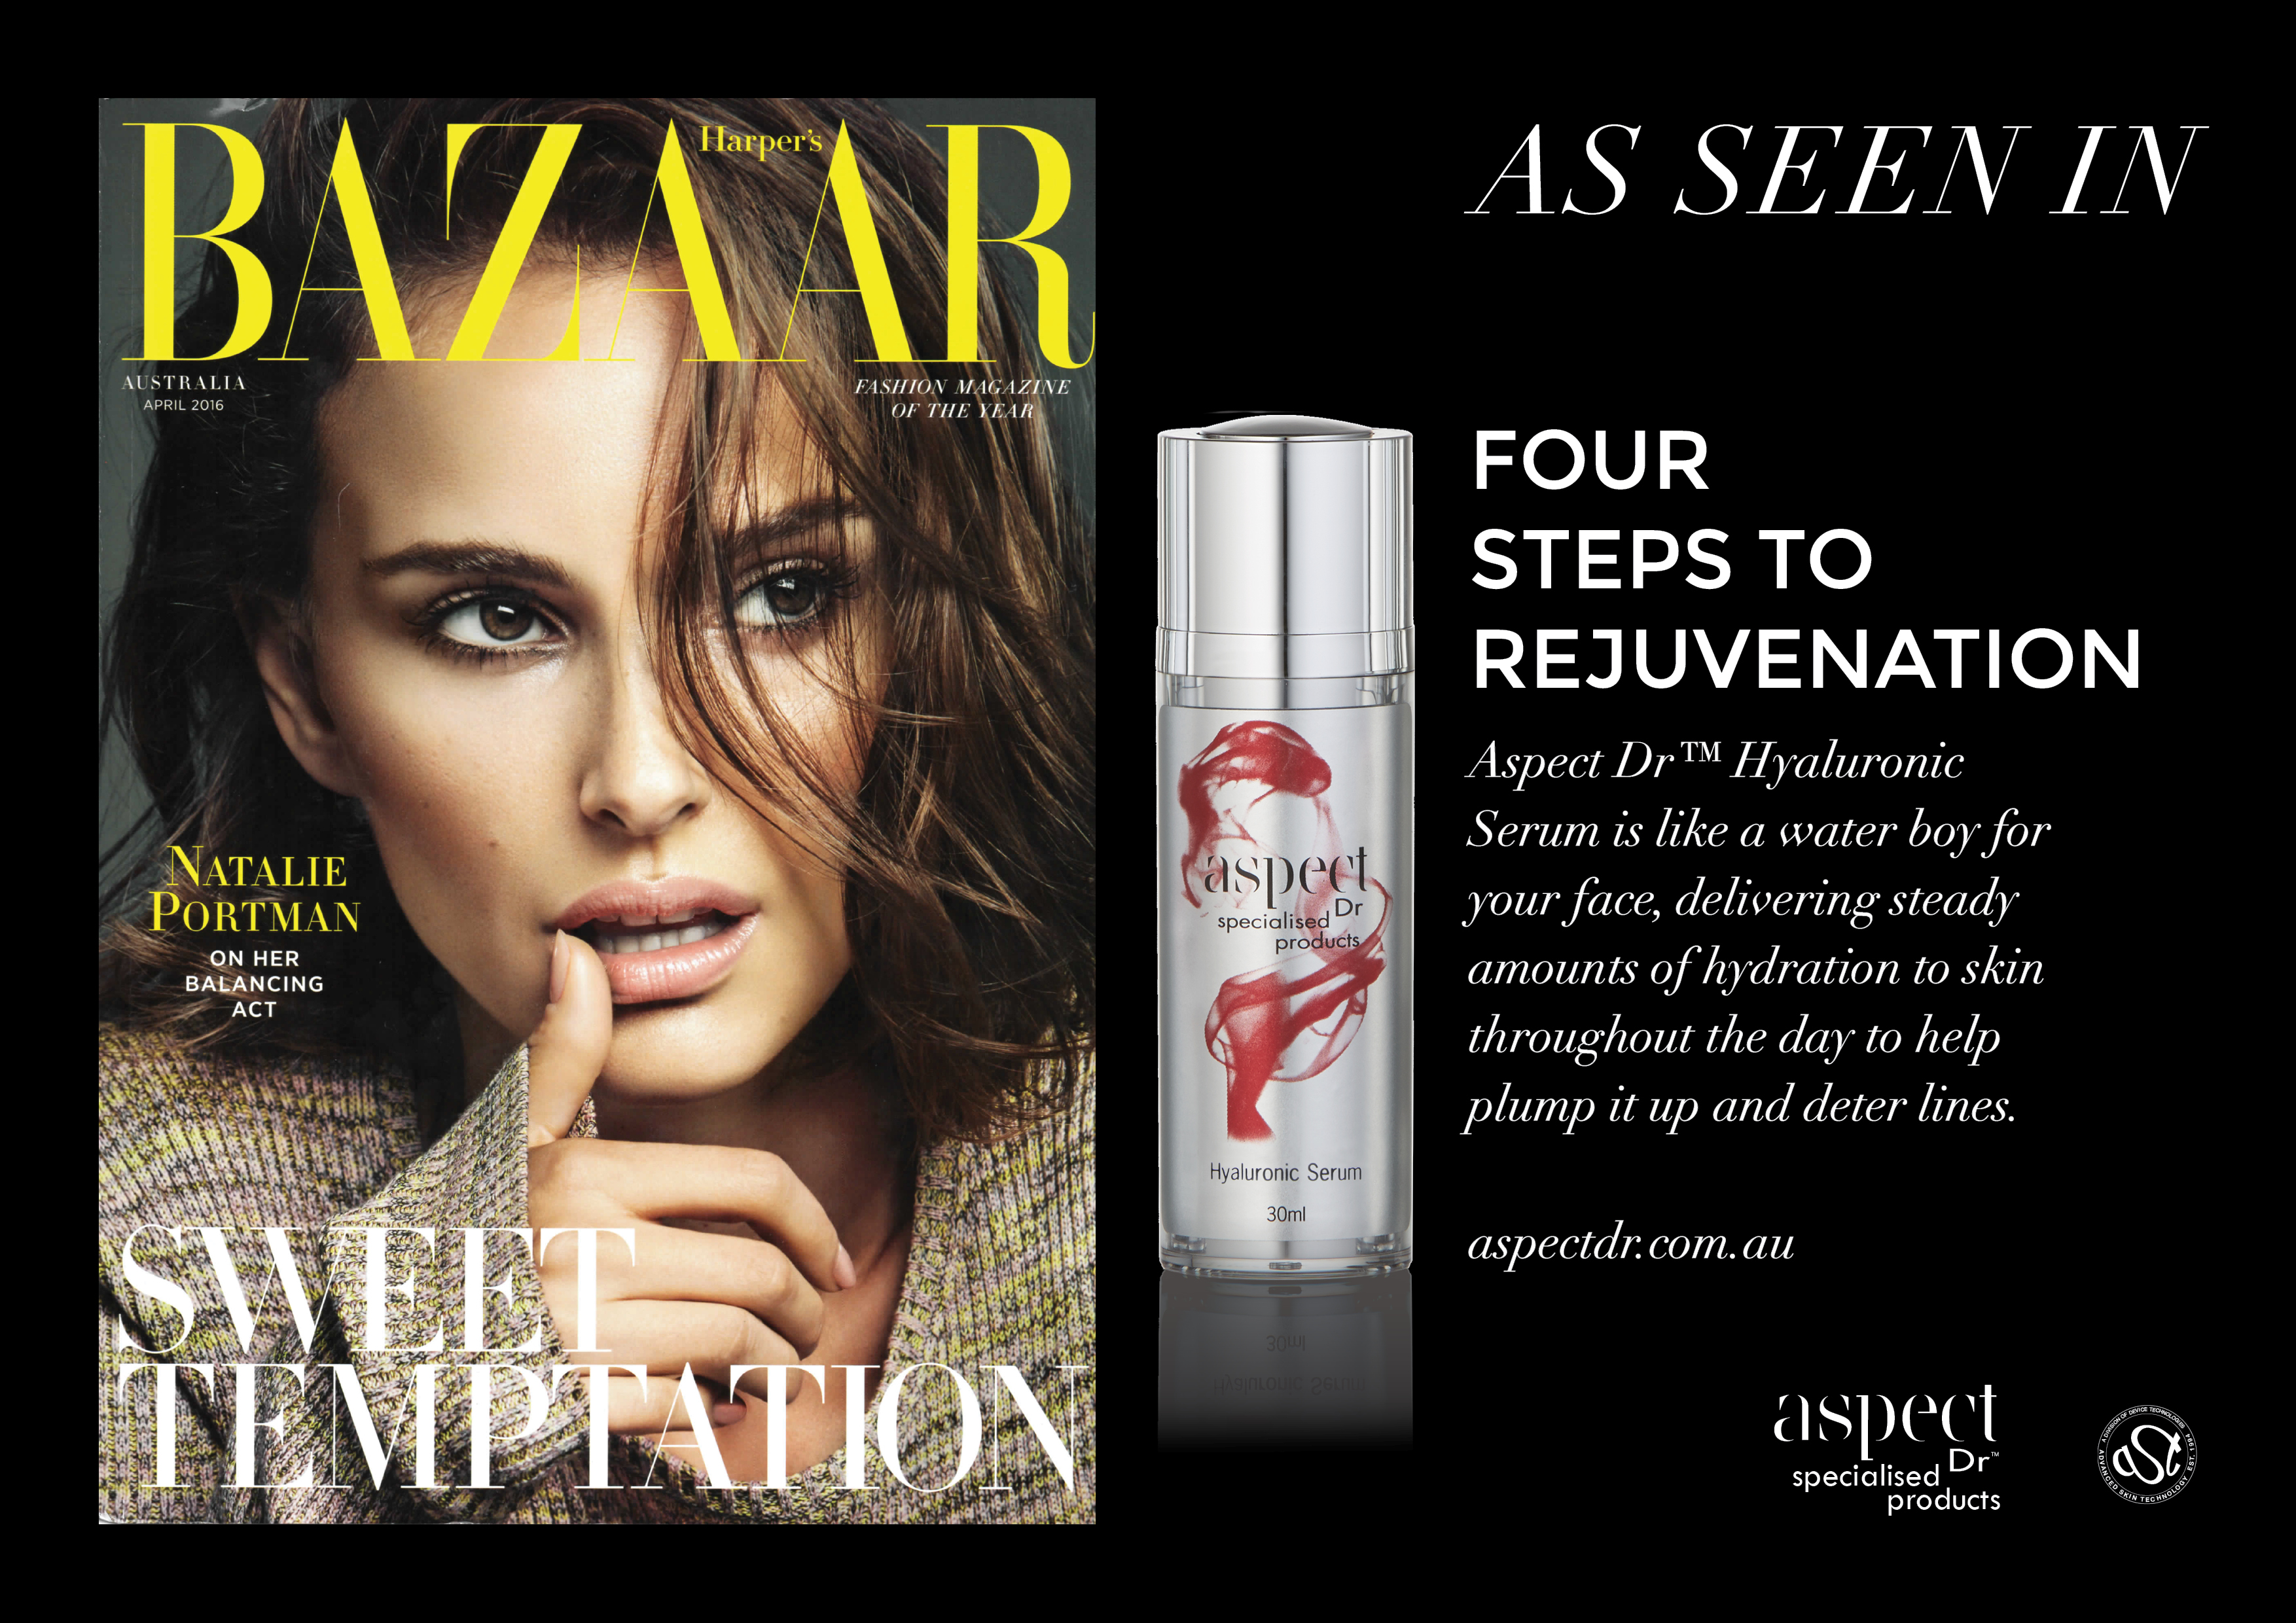 Aspect Dr - Hyaluronic Serum - Harpers Bazaar(1)